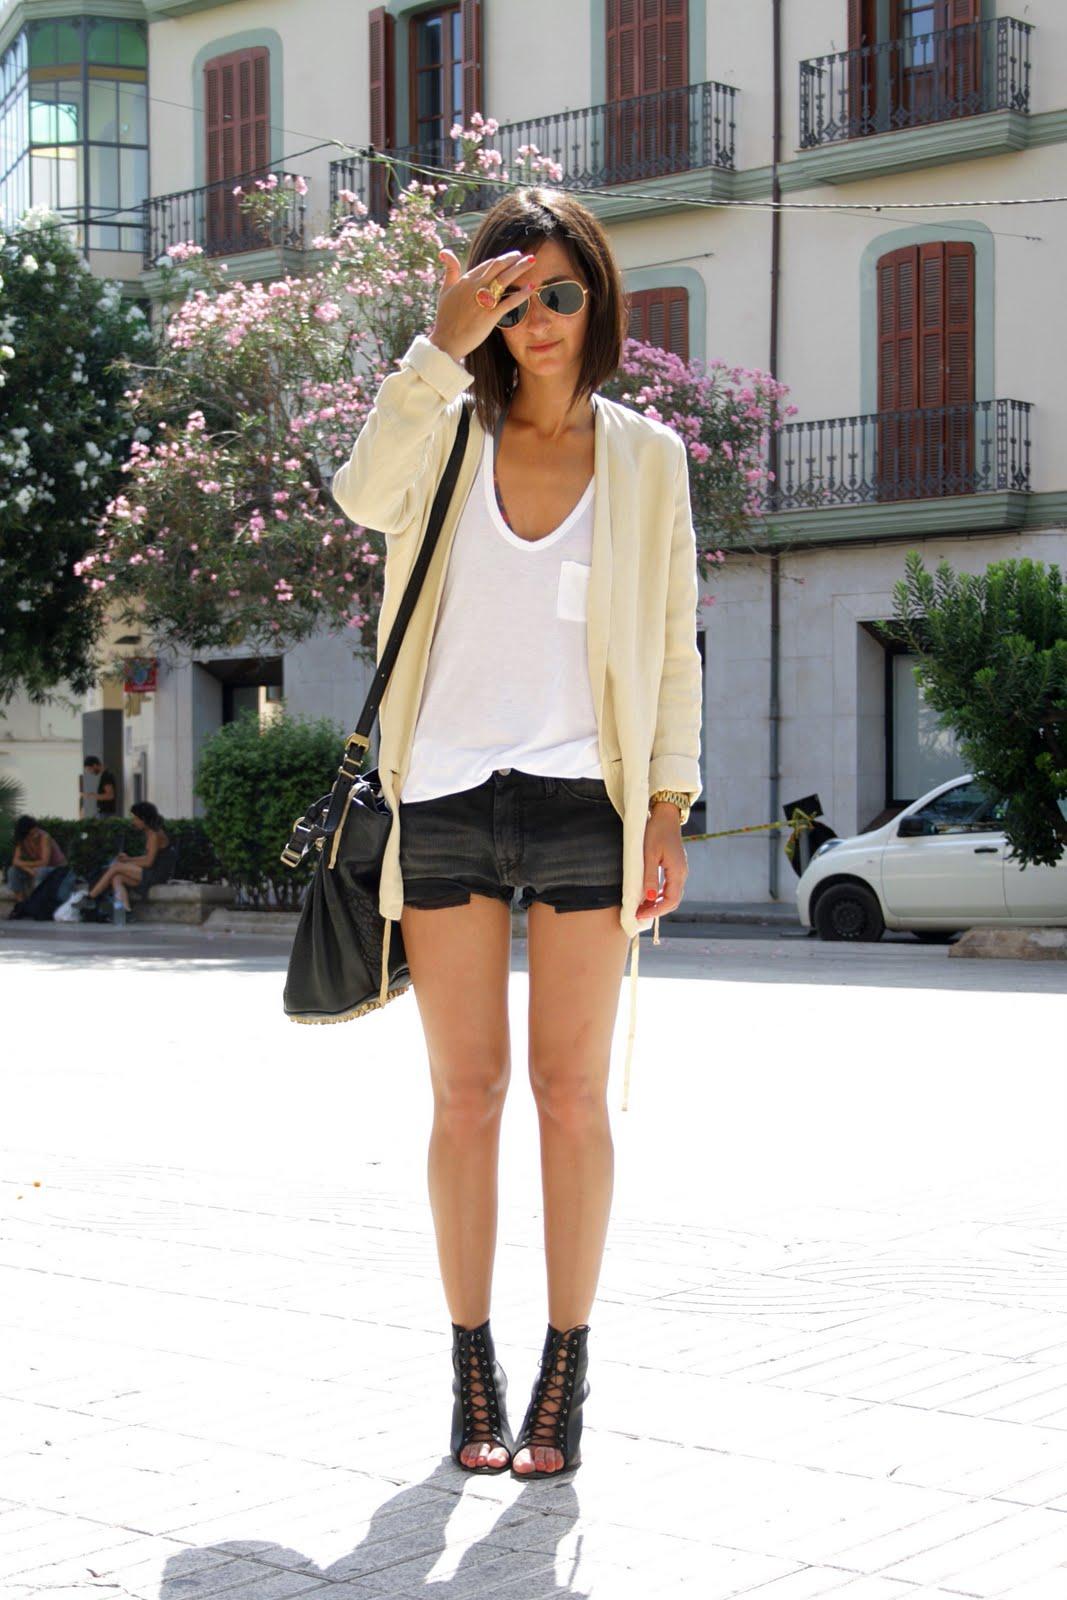 shorts-and-long-sleeves-look